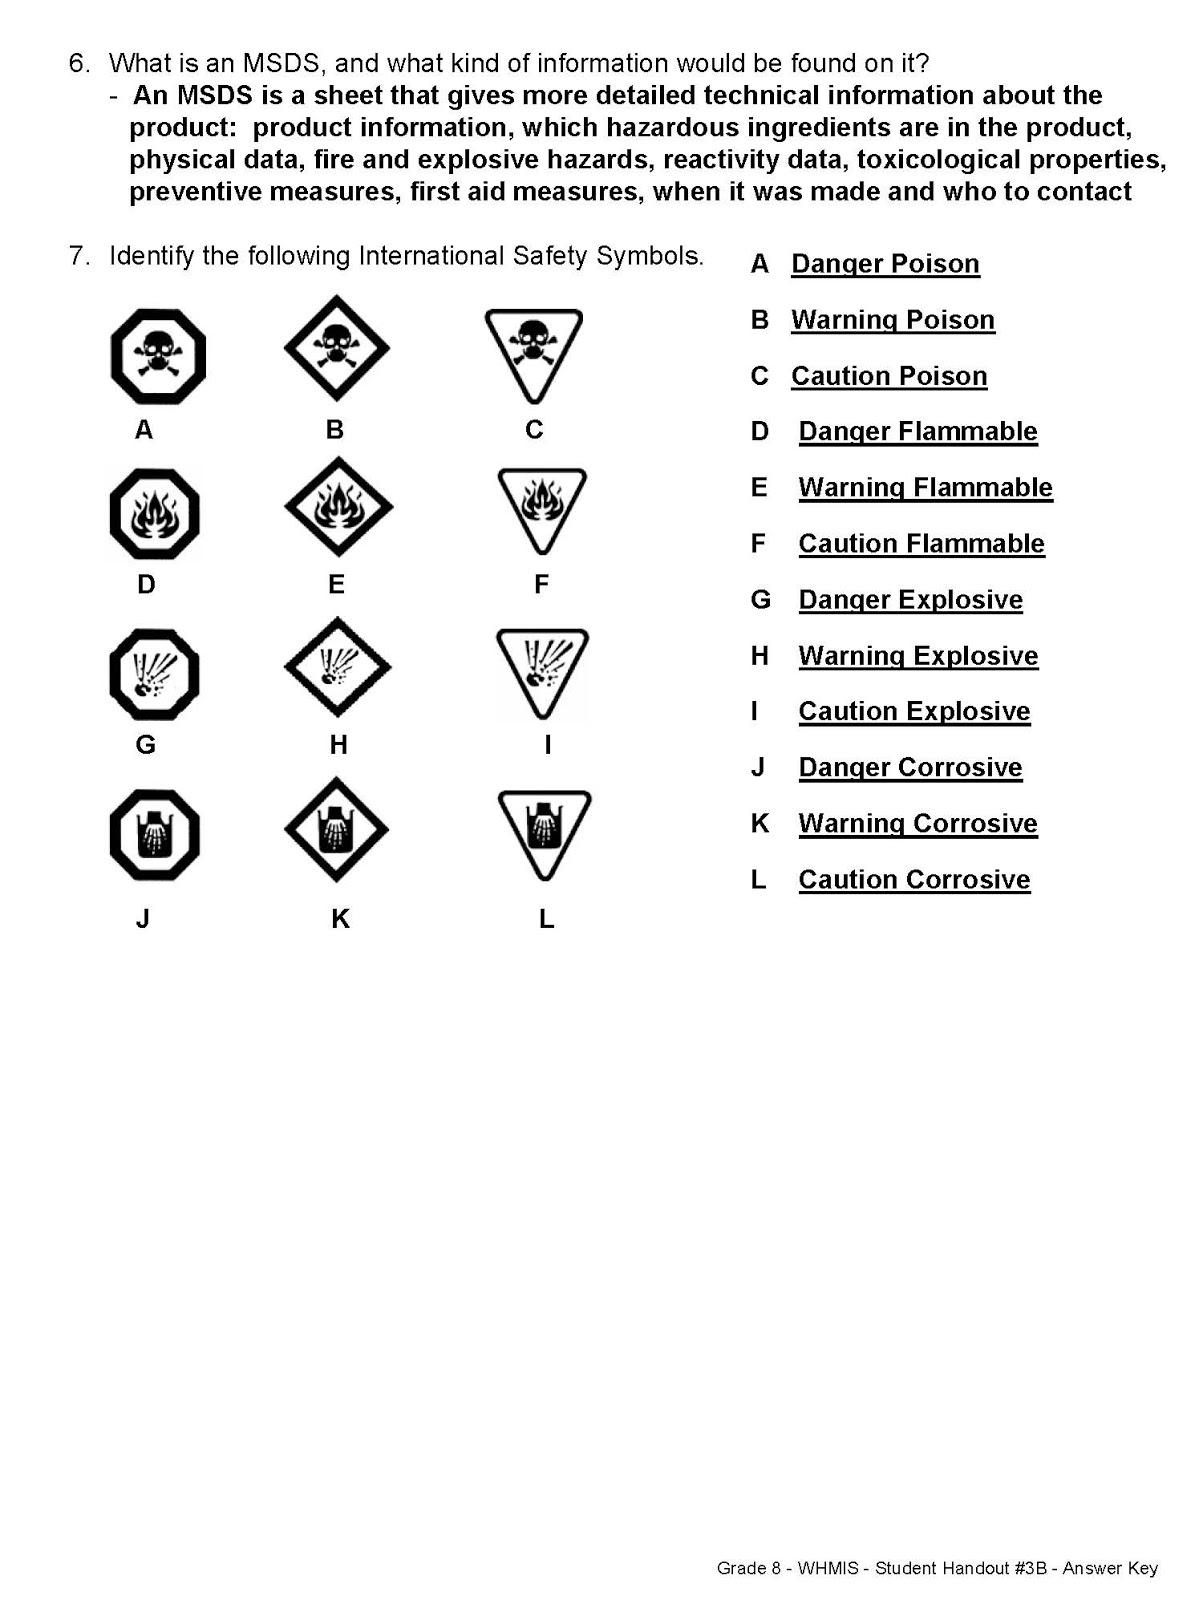 Science Safety Symbols Worksheet Free state diagram in uml